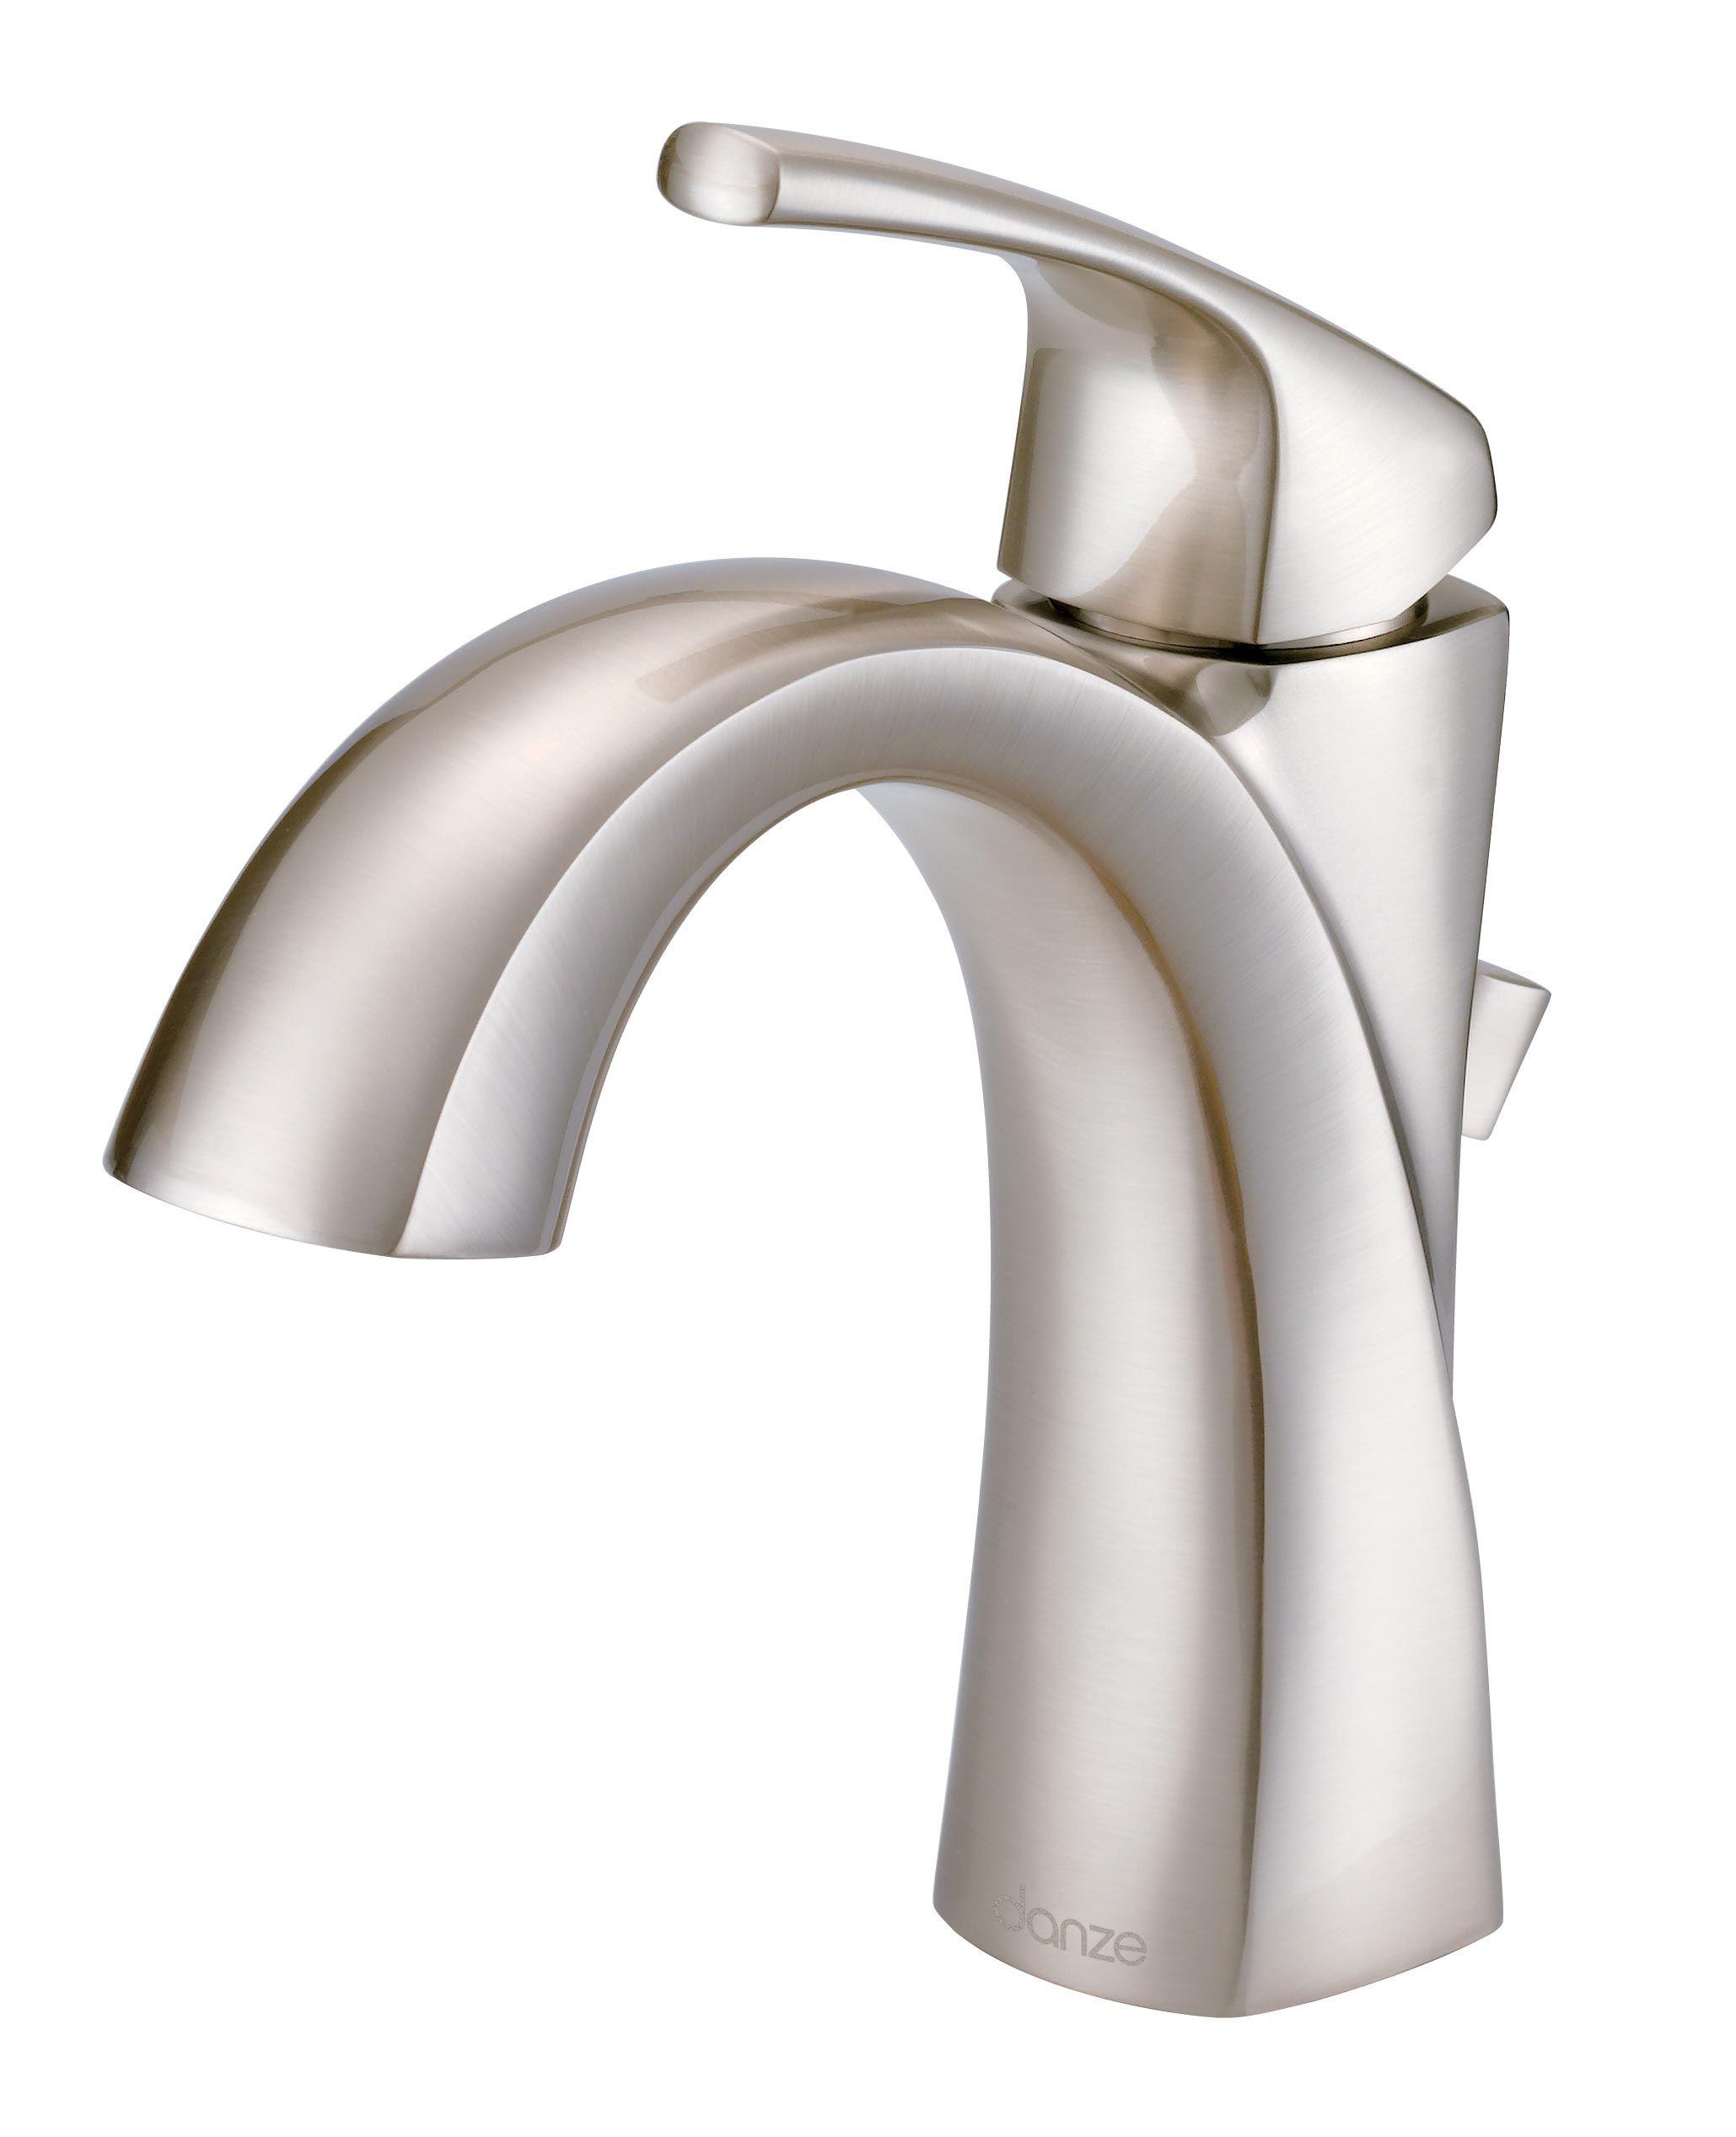 Danze D225018bn Vaughn Single Handle Bathroom Faucet Brushed